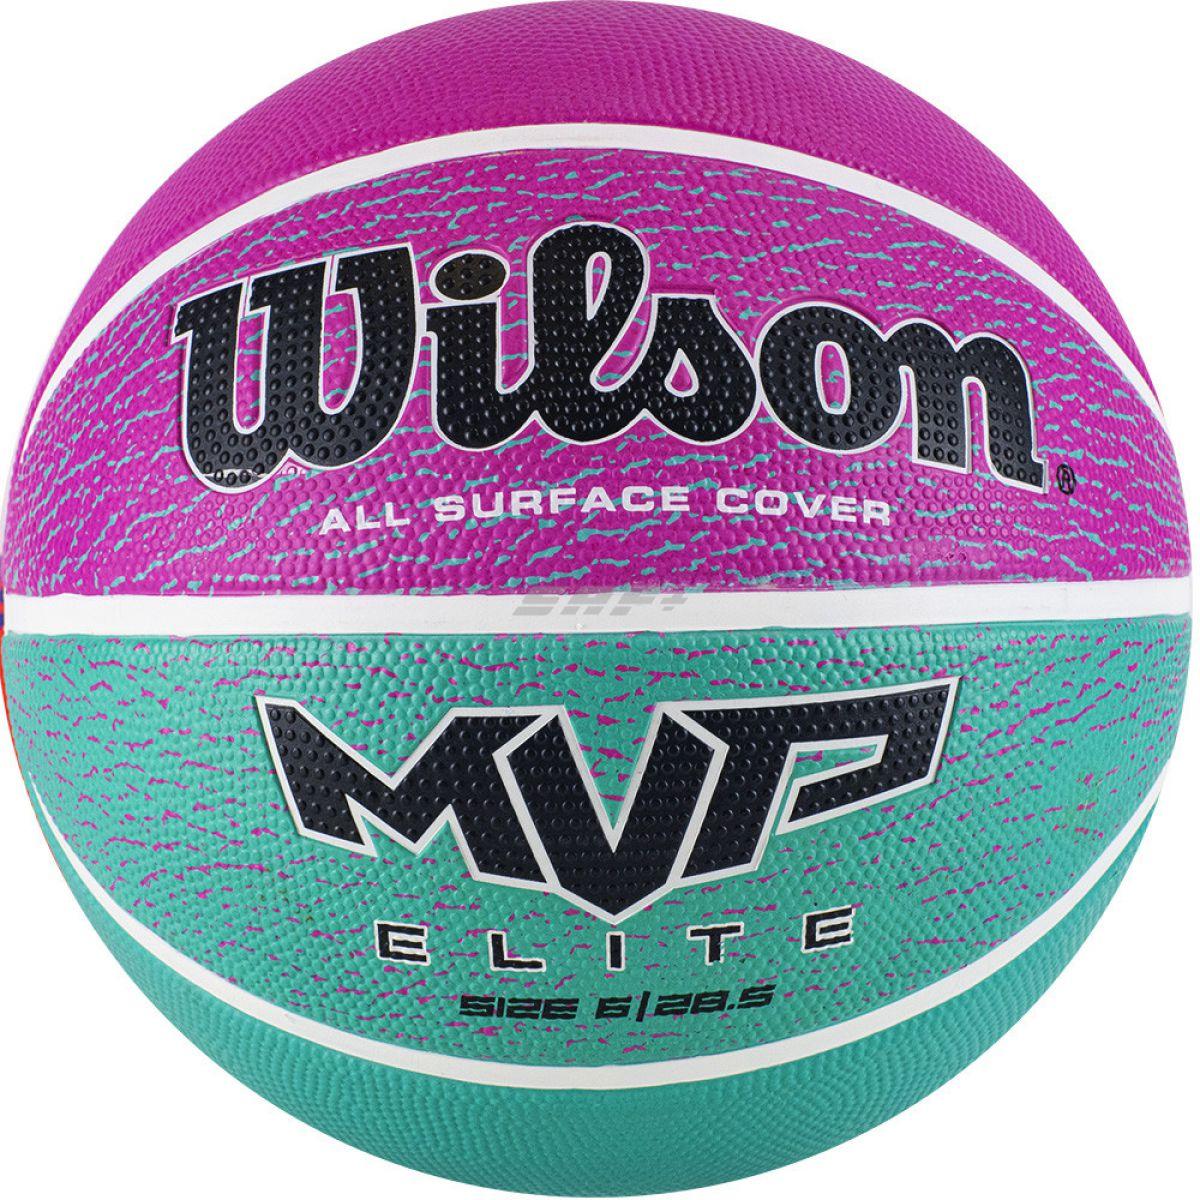 Мяч баск. WILSON MVP ELITE, арт.WTB1463XB06, р.6, резина, бутил.камера, бирюзово-фиолетово-черный